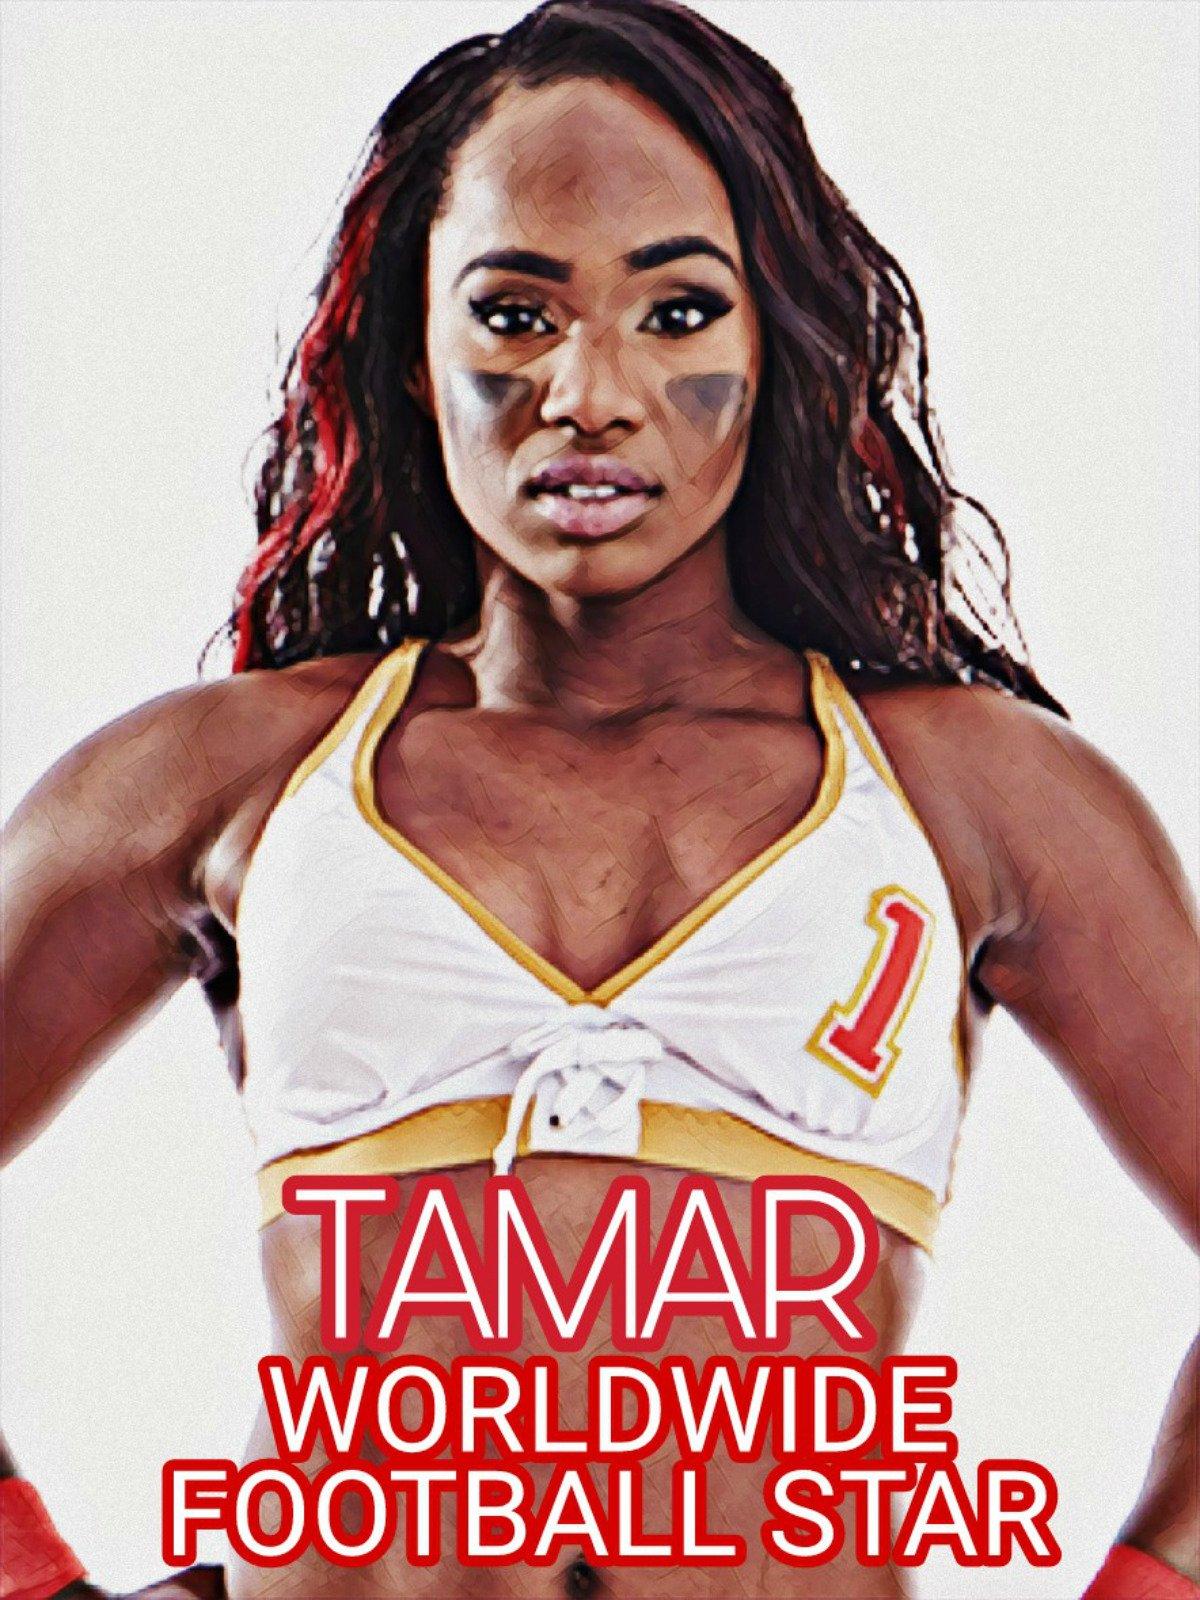 Tamar Worldwide Football Star